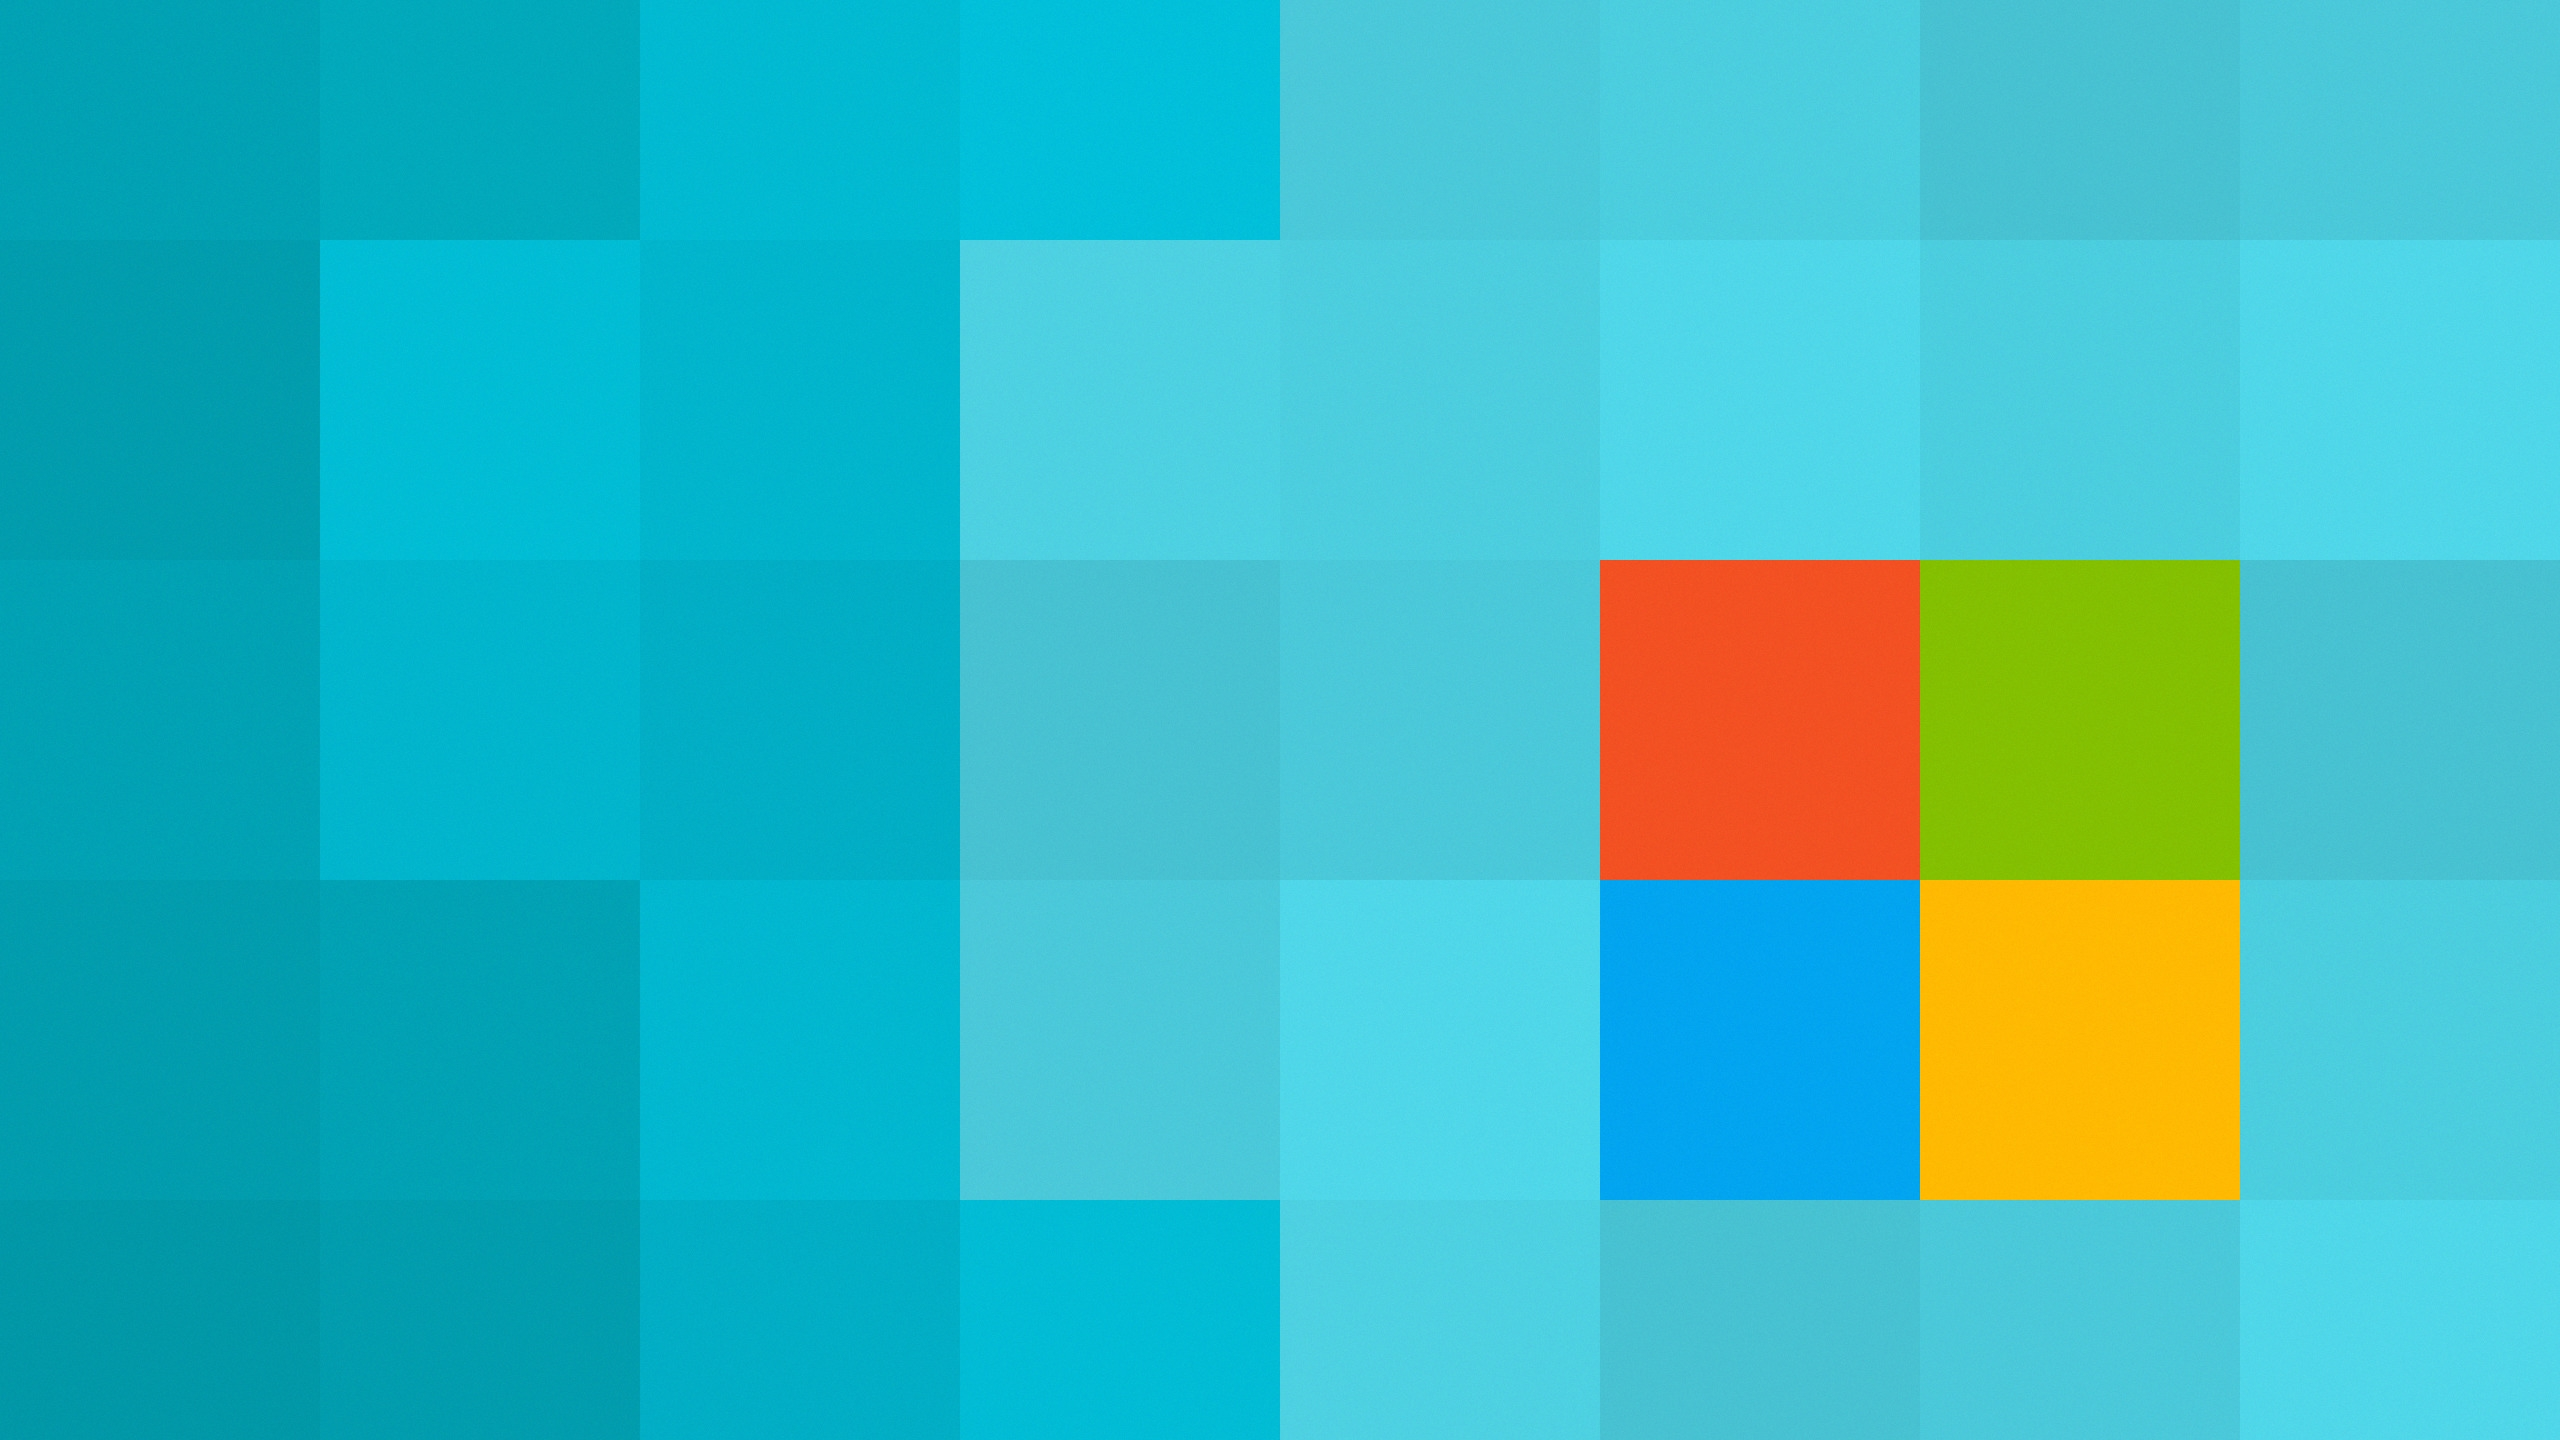 windows 10 wallpaper background 49911